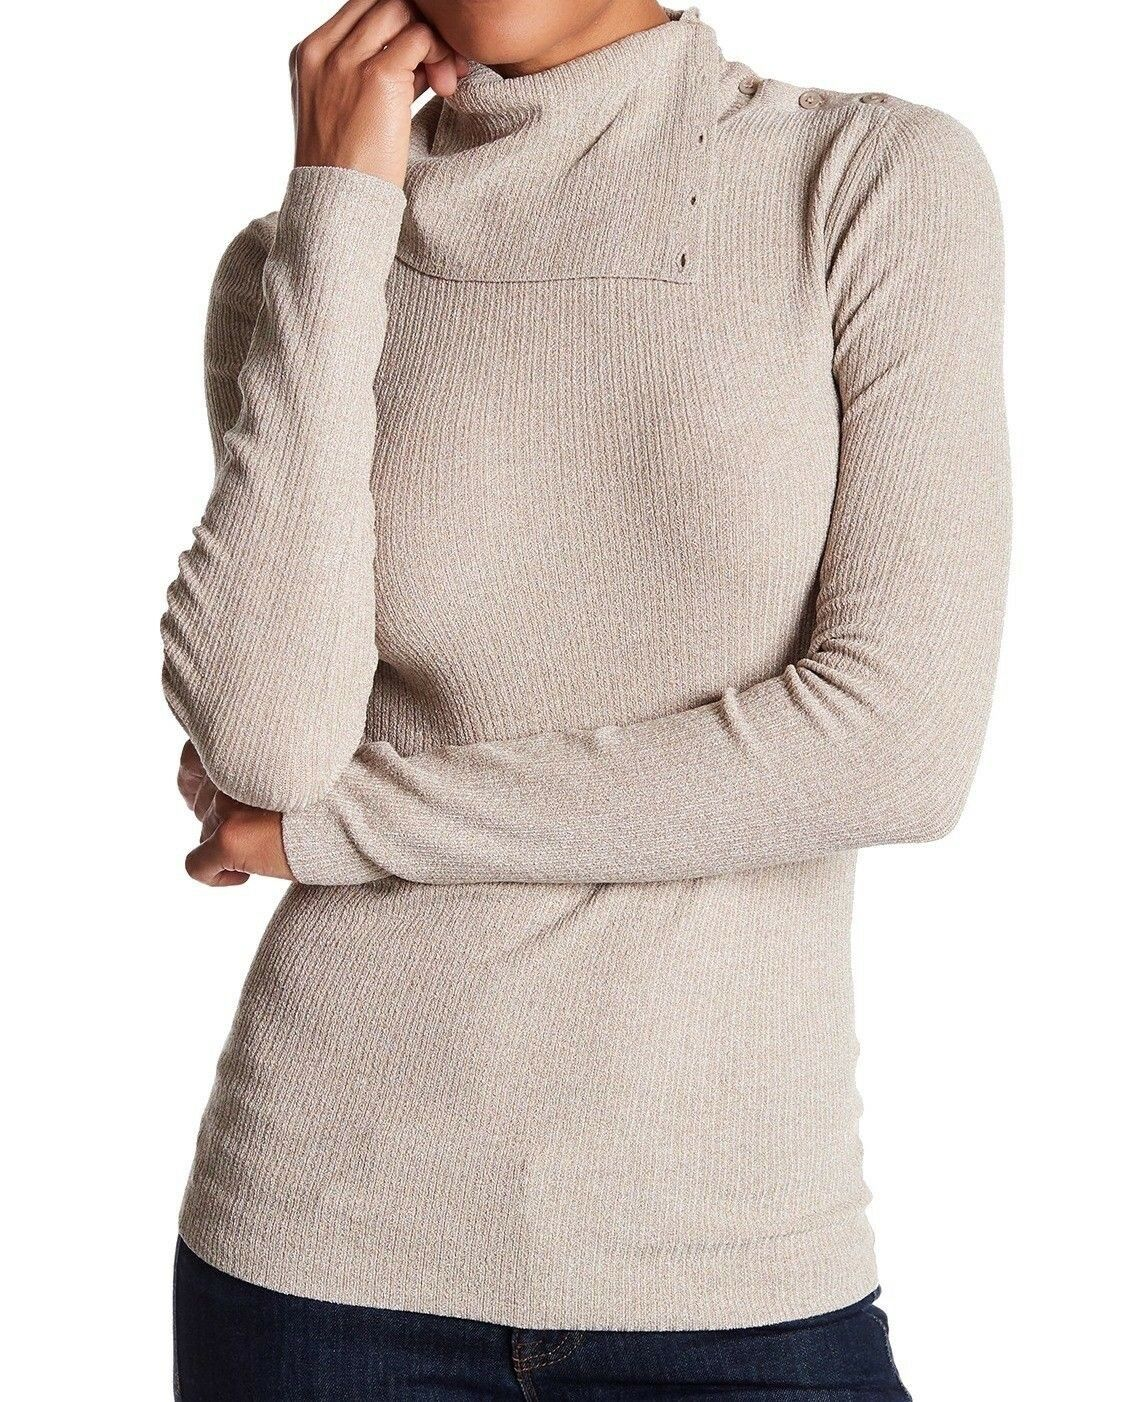 NWT   295 Theory Leendelly B Volt Asymmetrical Sweater [SZ Large]